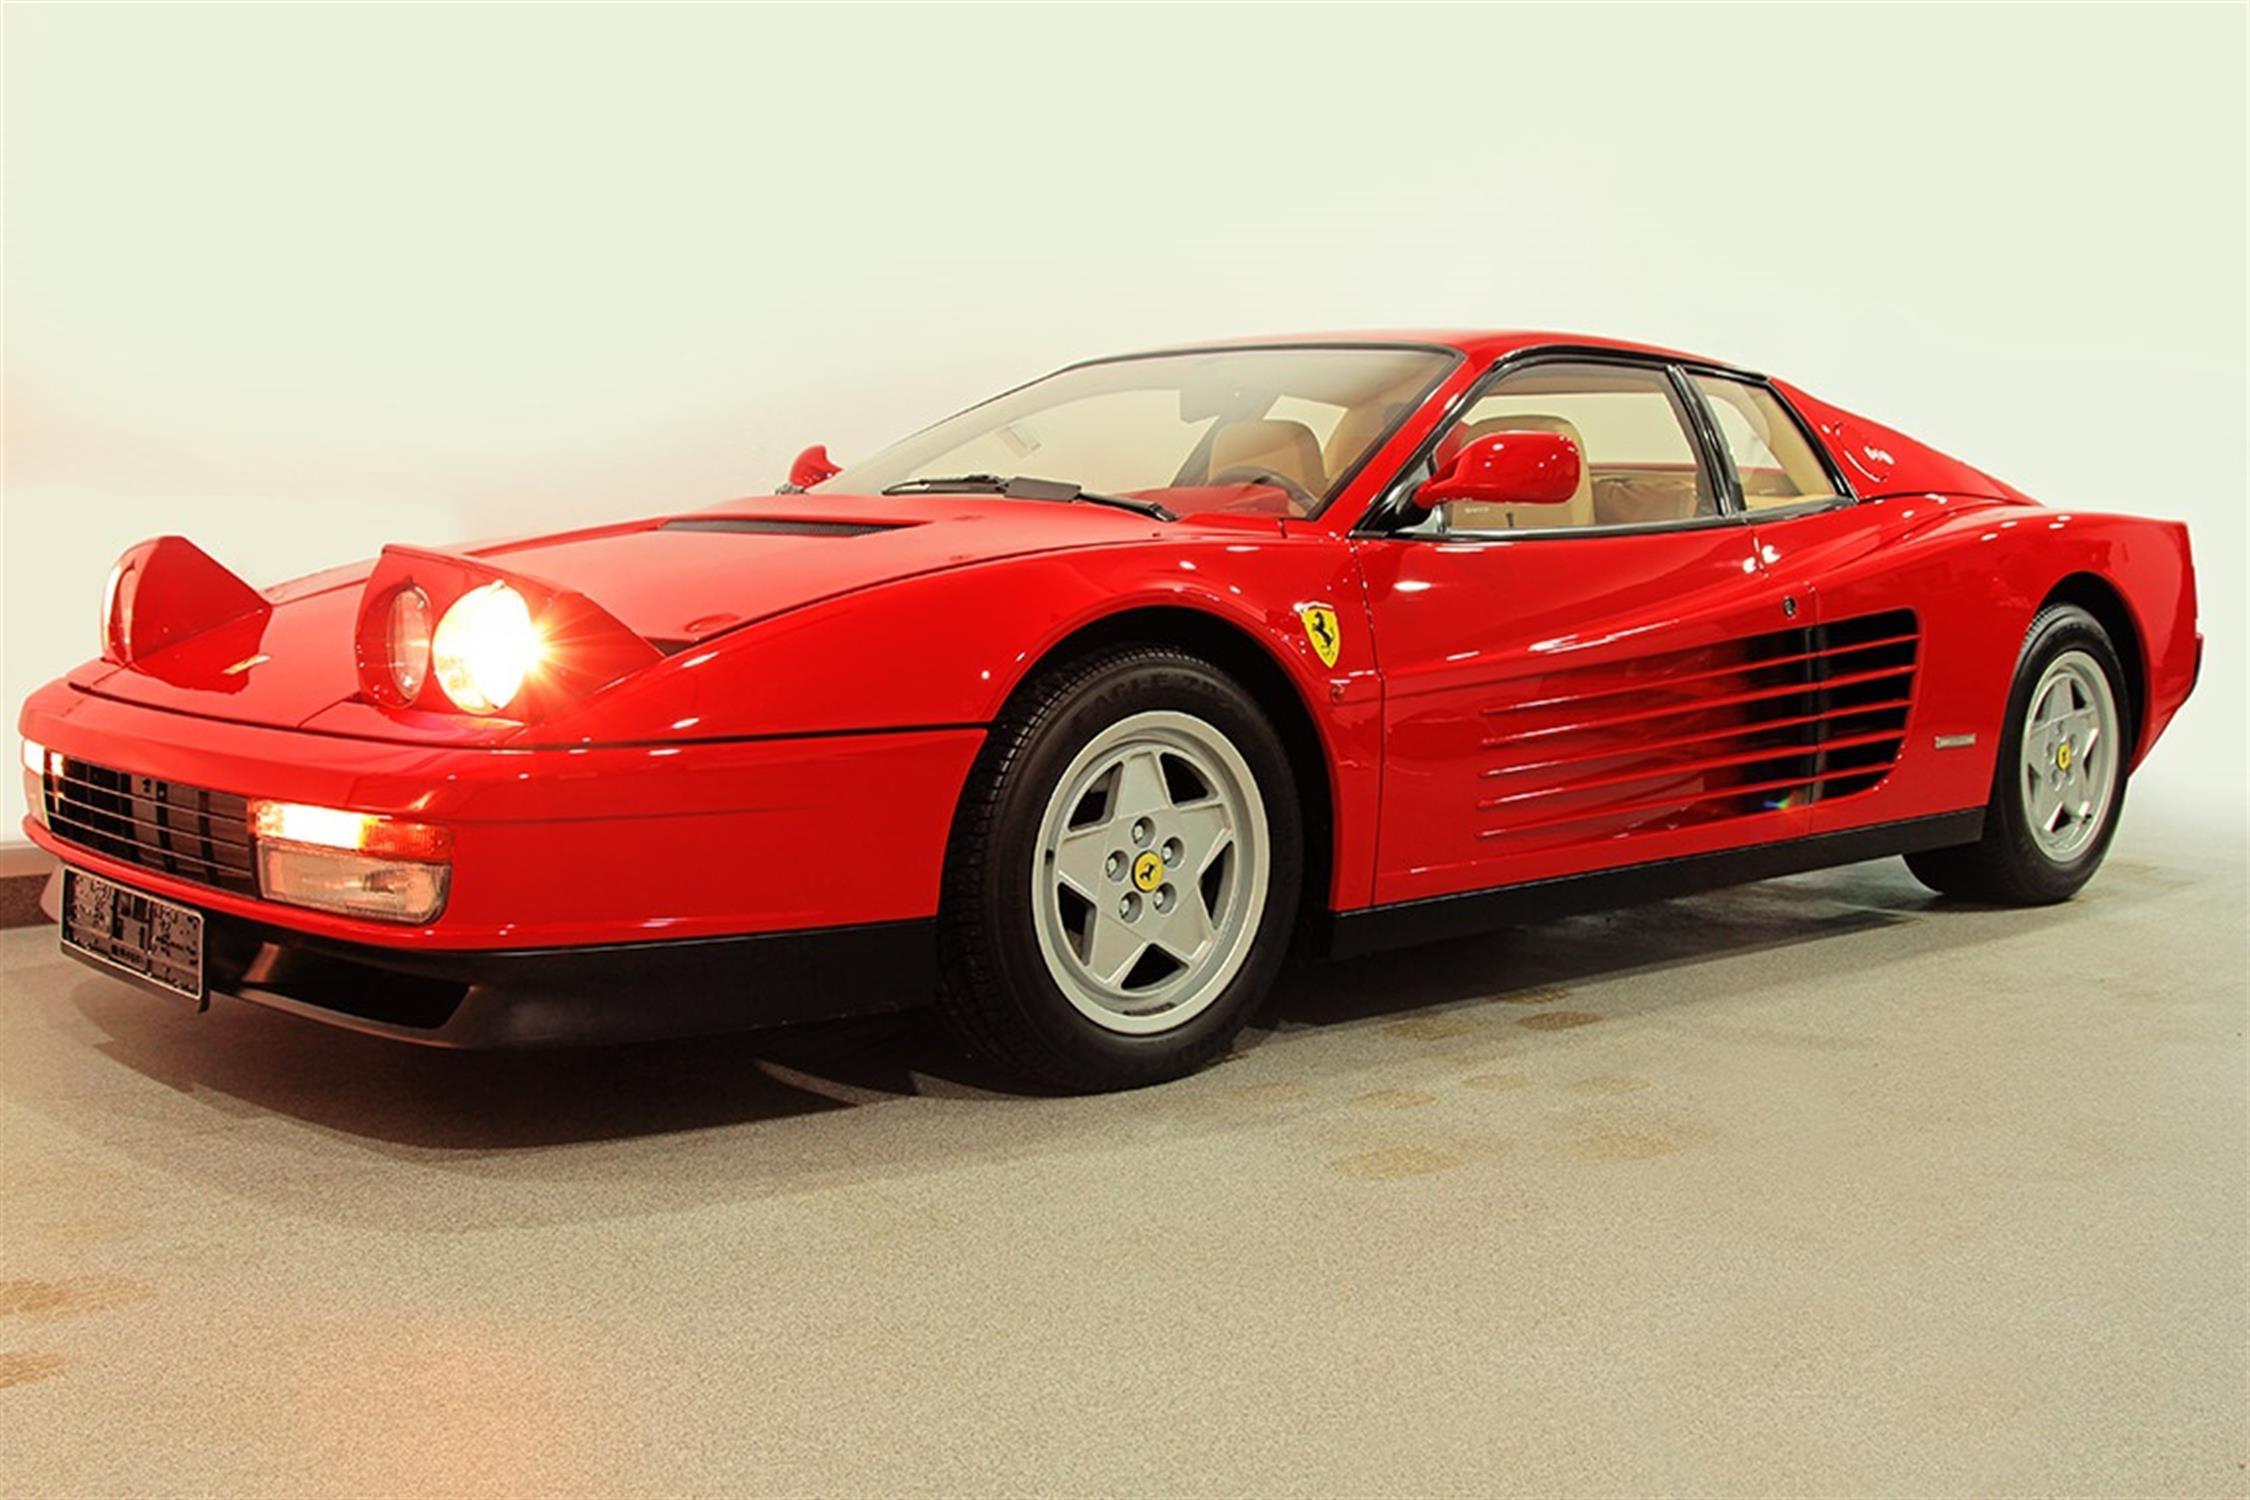 1991 Ferrari Testarossa - 1,829 Kilometres From New & Classiche'd